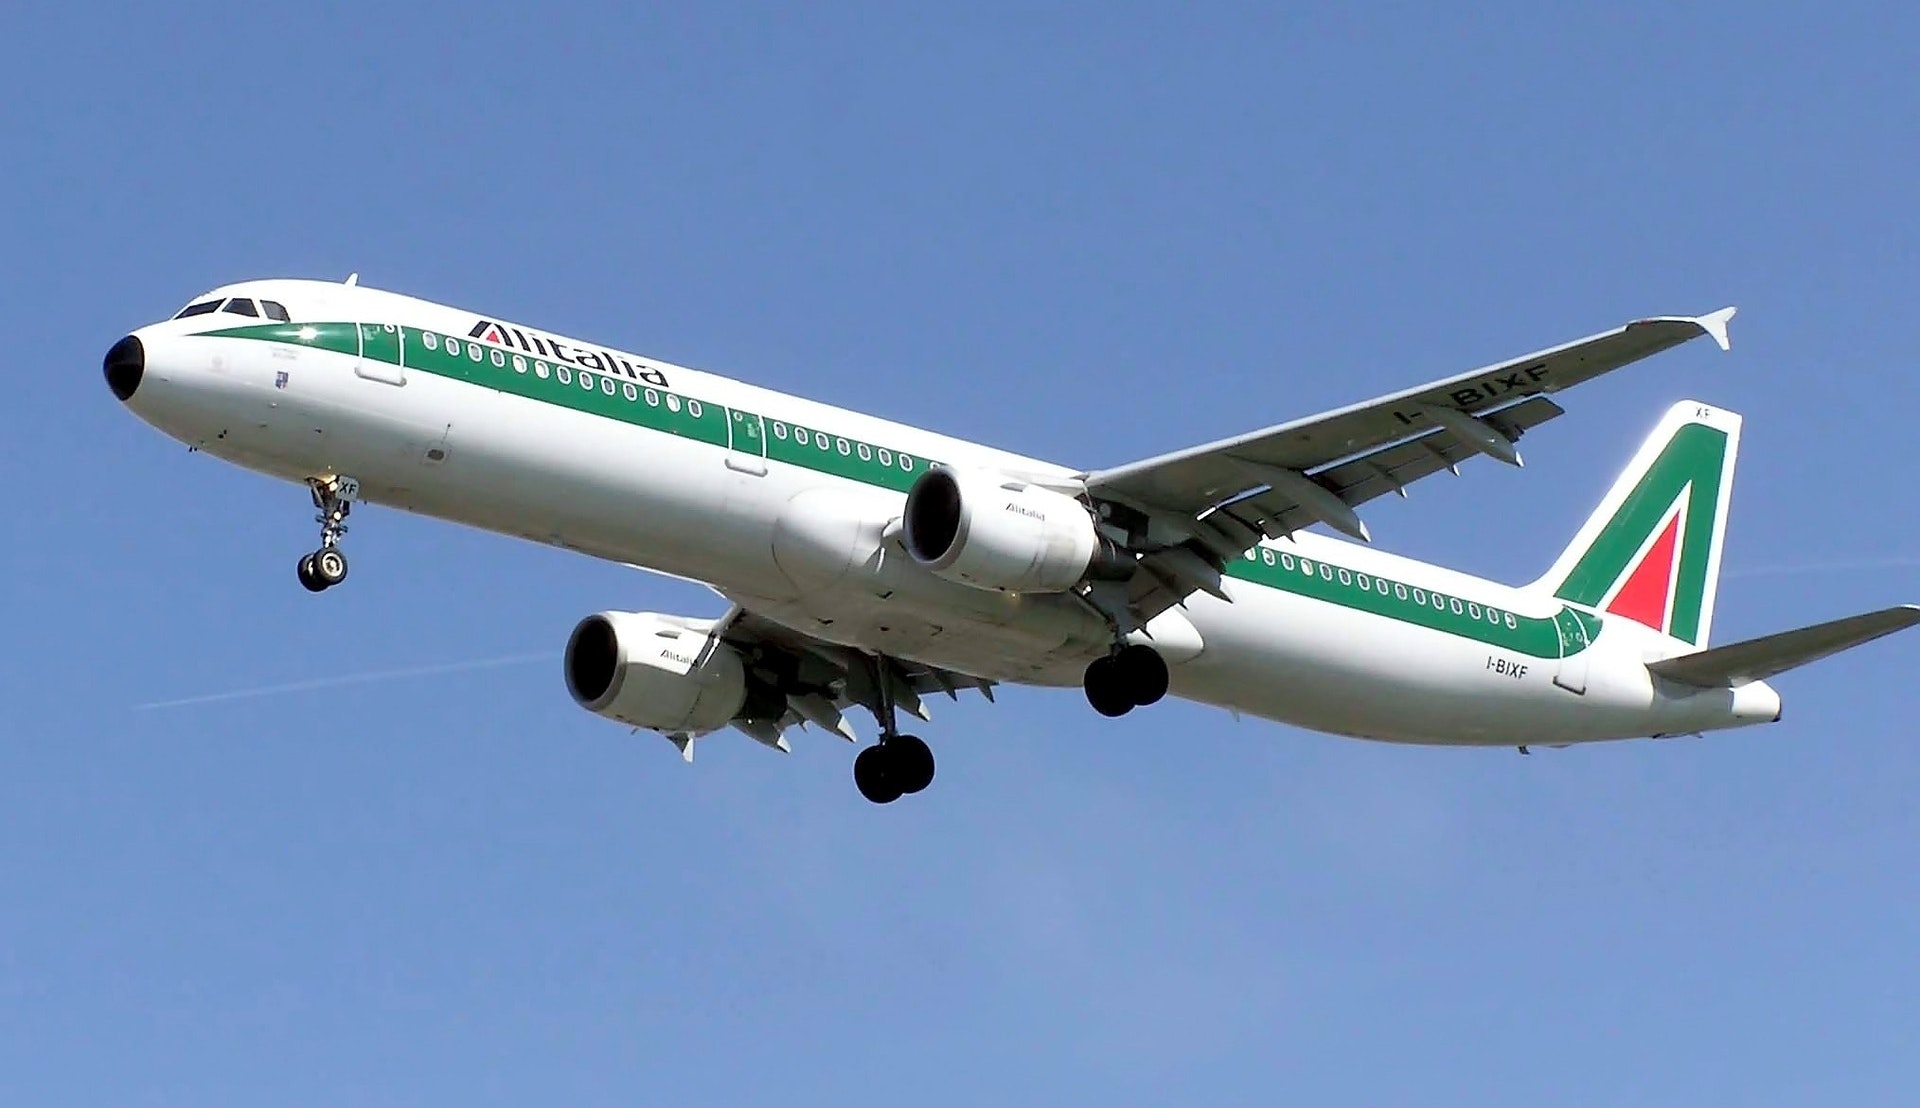 Alitalia A321 © skeeze, Pixabay